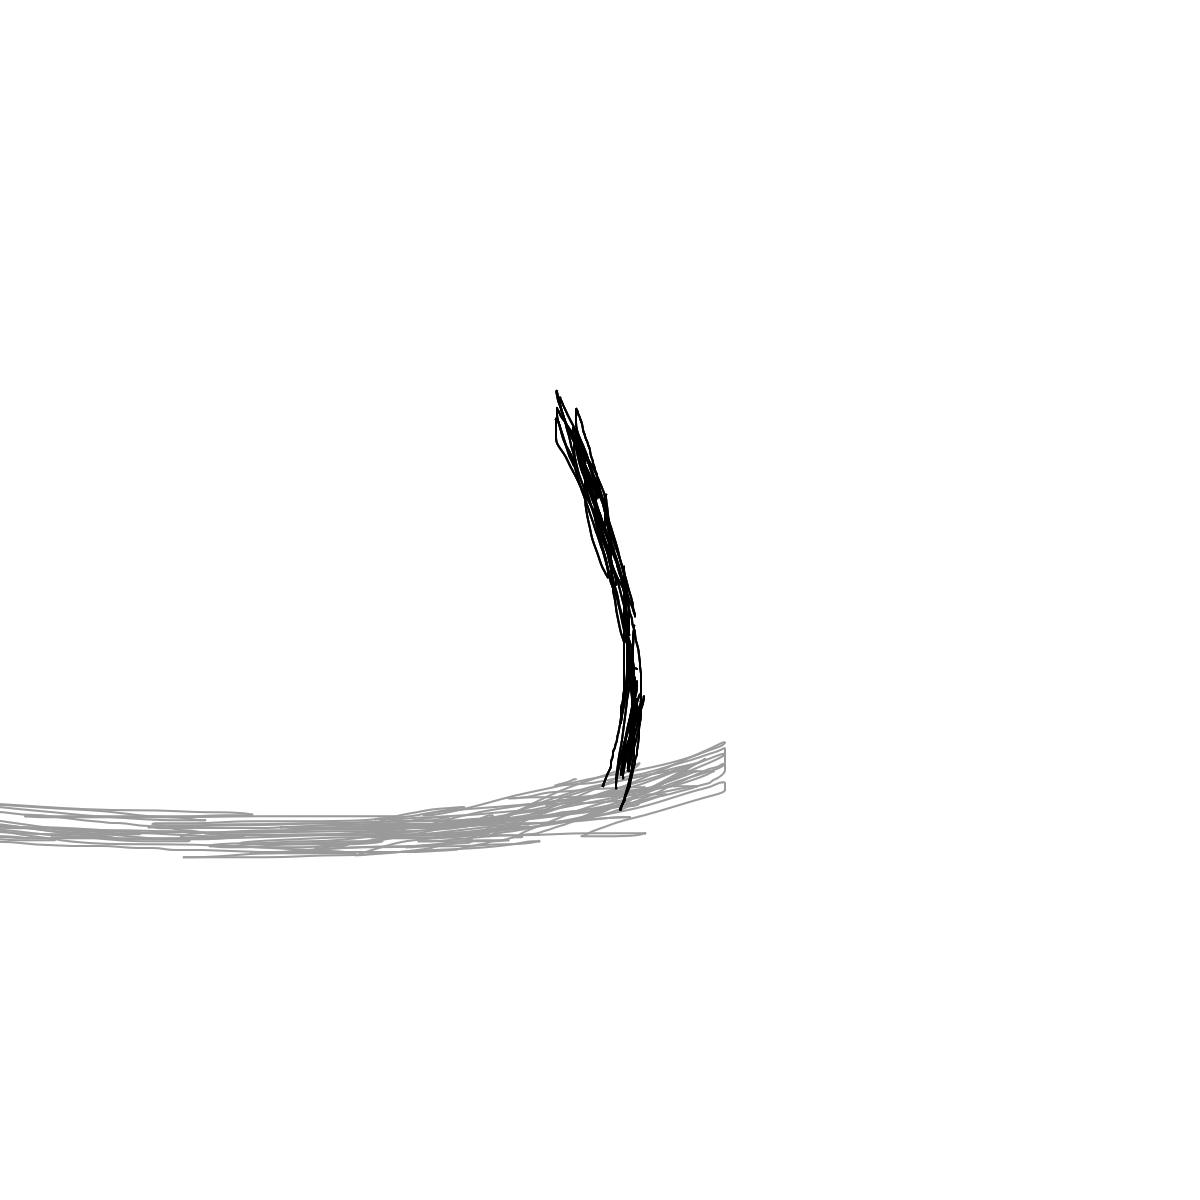 BAAAM drawing#765 lat:44.3511466979980500lng: -4.6806712150573730